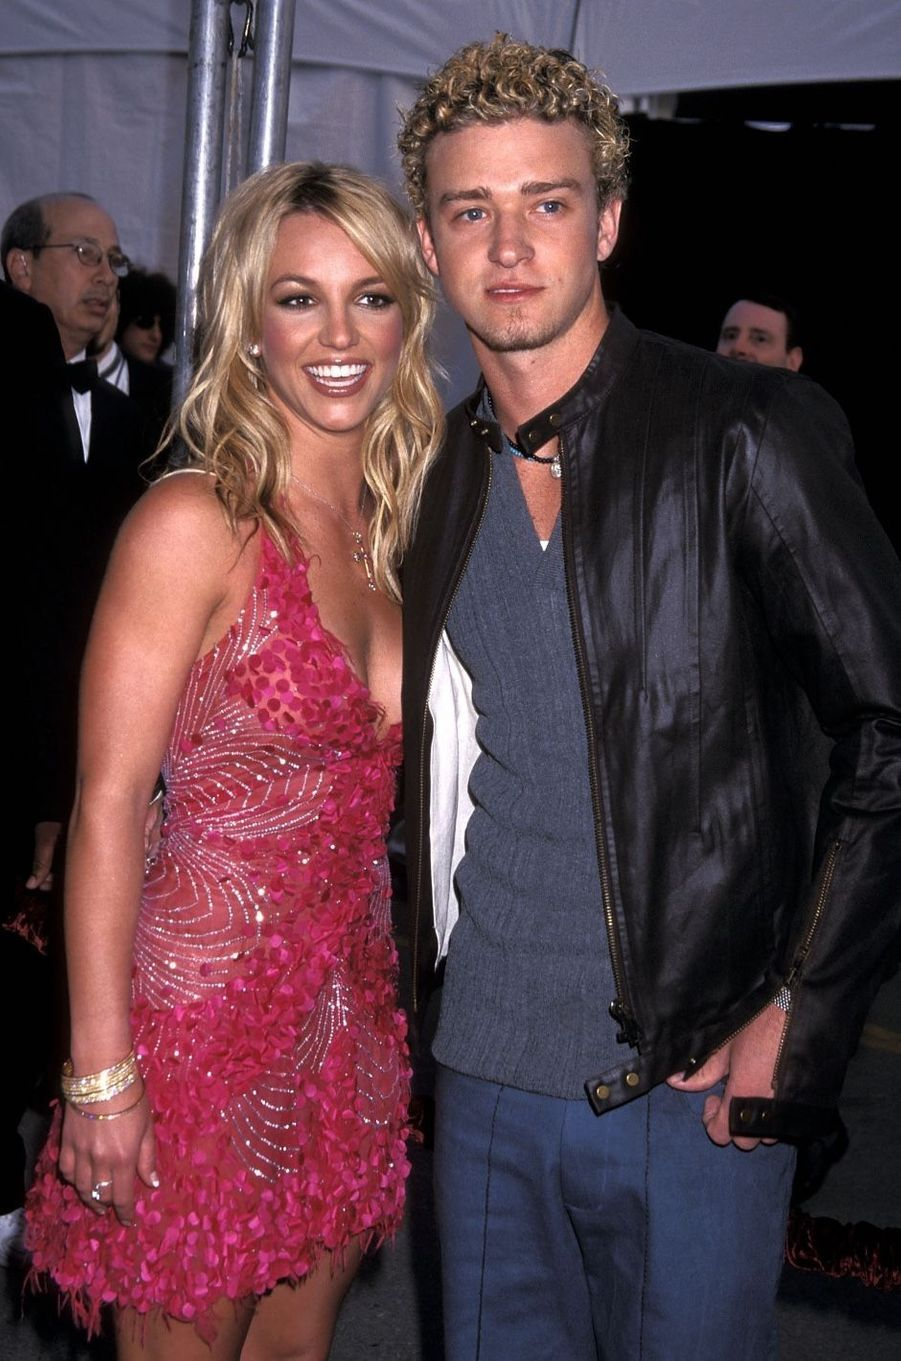 Britney Spears et Justin Timberlake en 2002. Ils ont officialisé leur relation en 1999 et ont rompu en 2002.